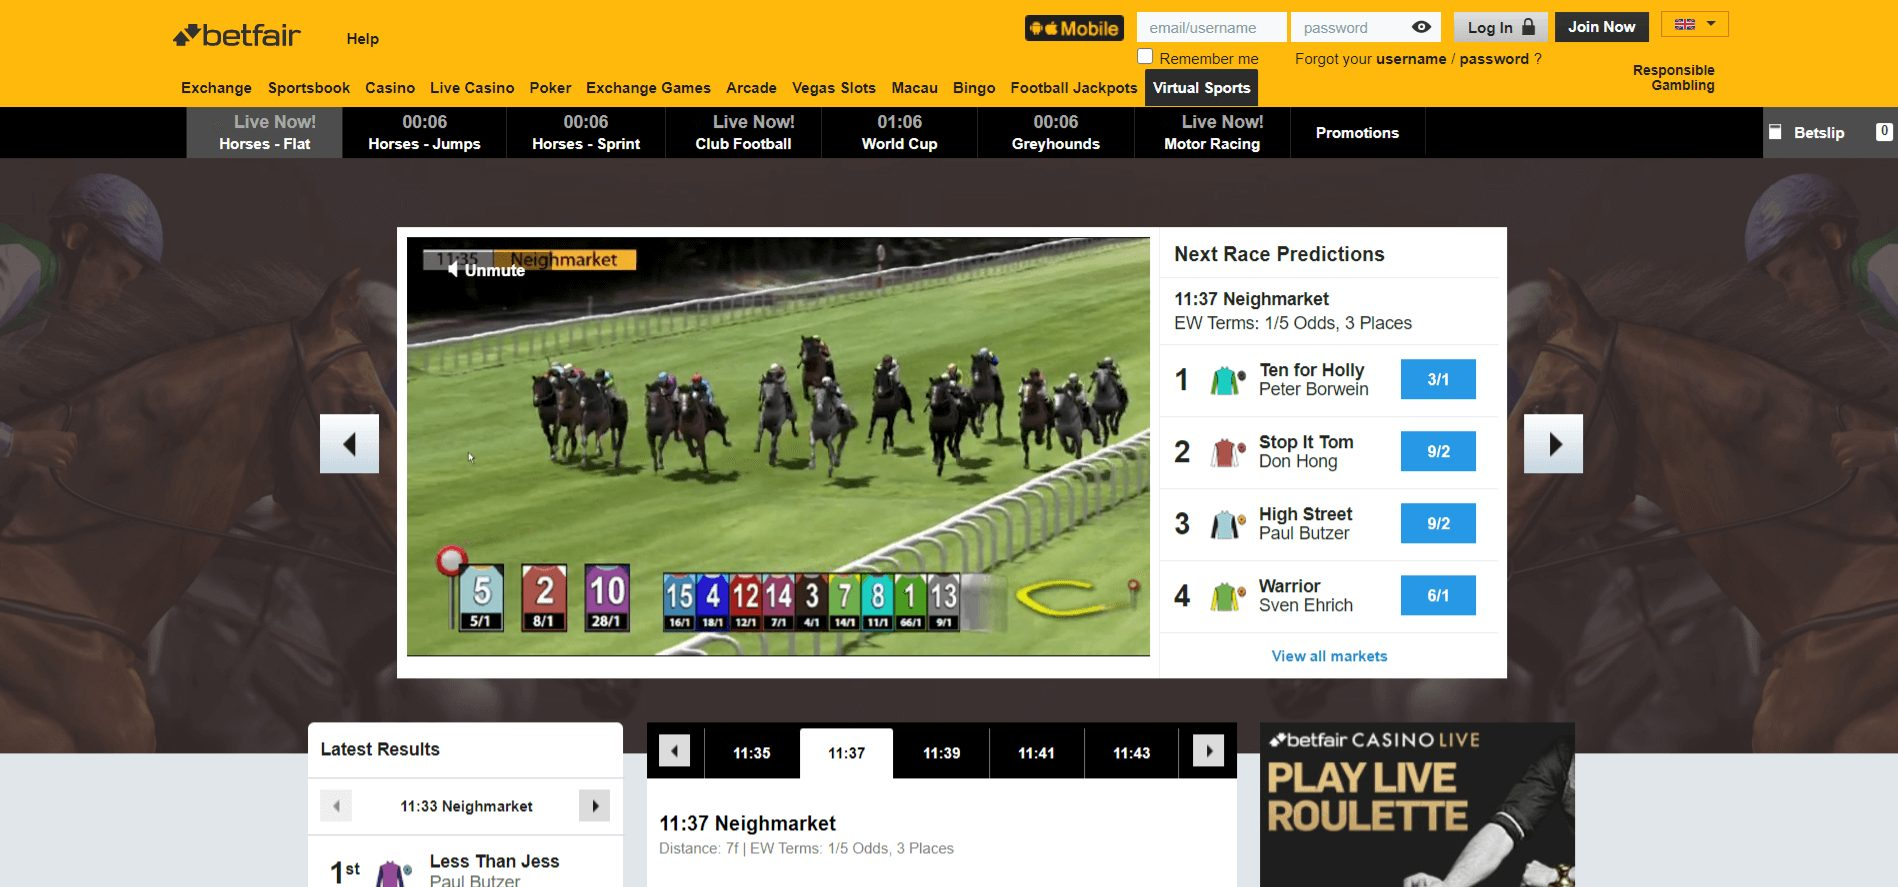 discover virtual sports at betfair